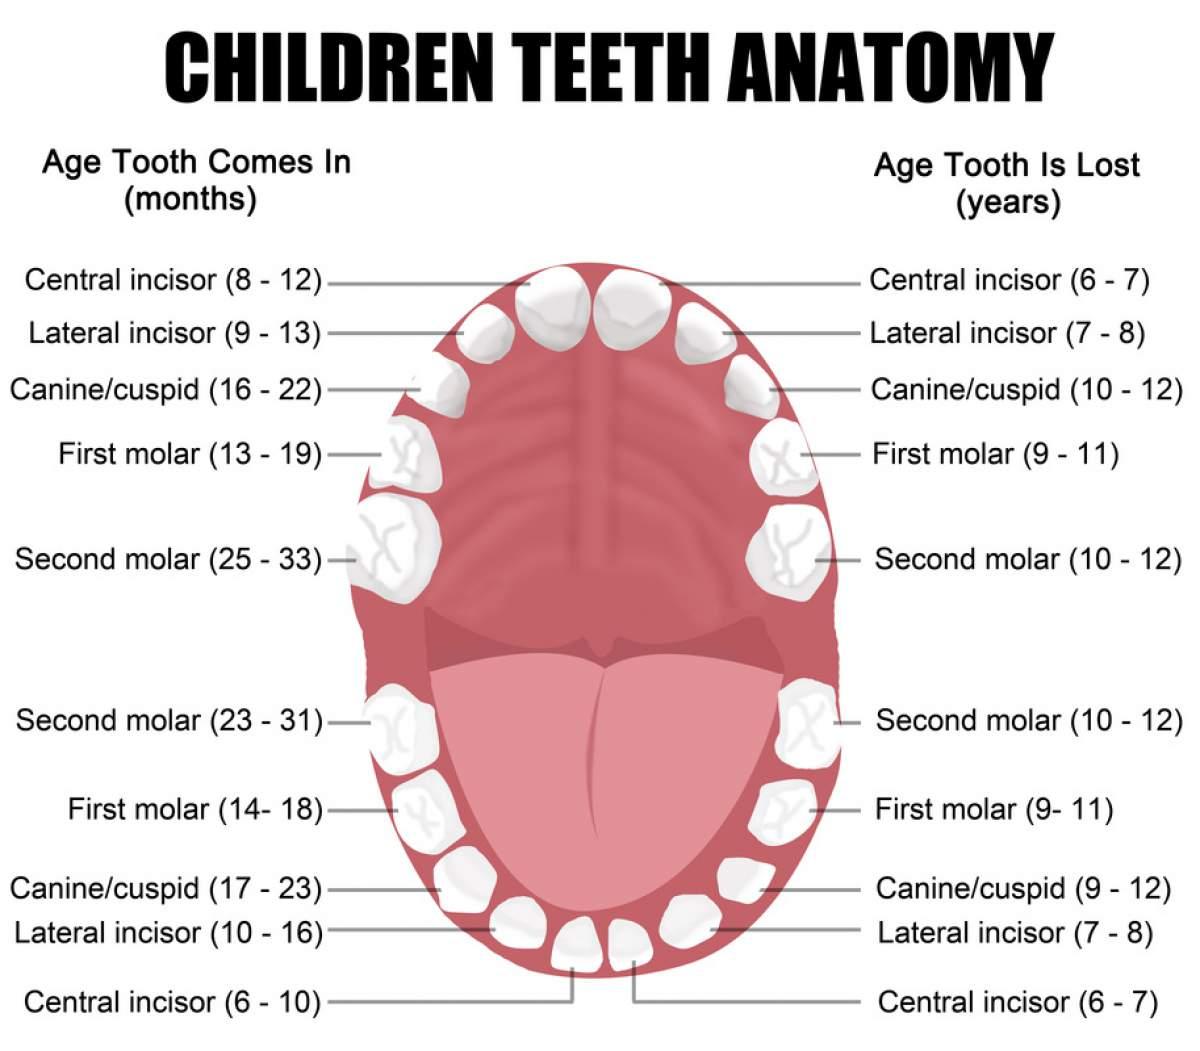 کلینیک دندانپزشکی آرکا - دندانپزشکی کودکان - رویش دندانهای شیری